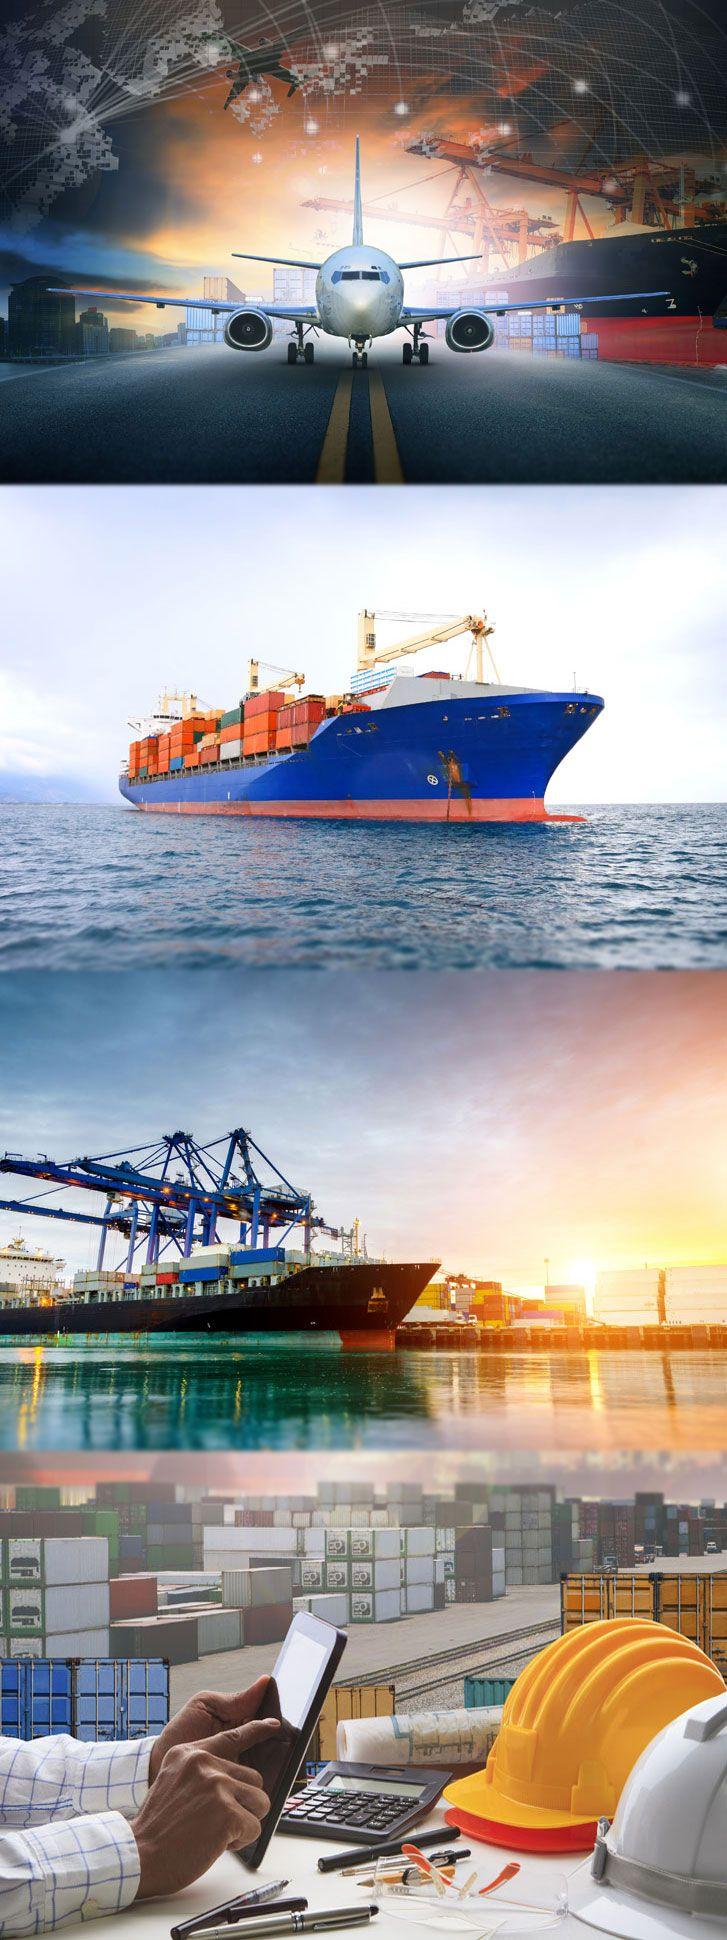 India Revolutionises its PortLed Development for its